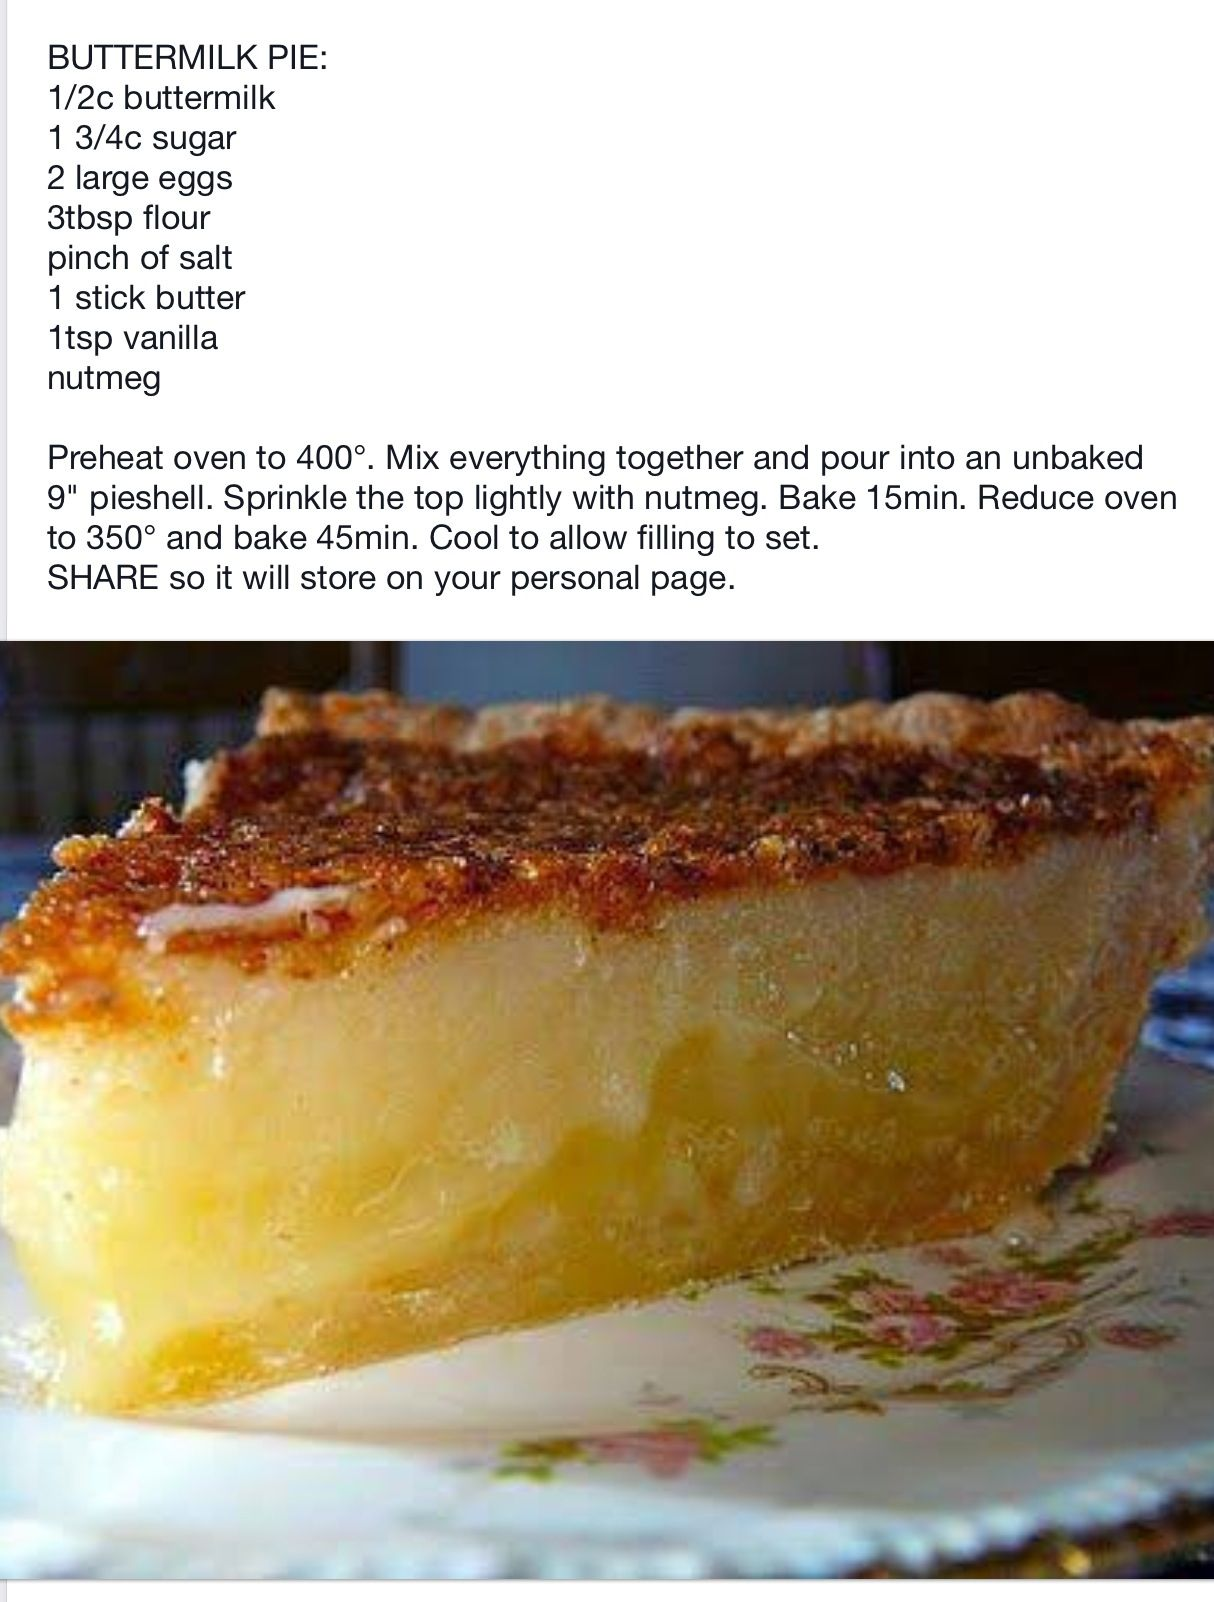 Buttermilk Pie Southern Buttermilk Pie Buttermilk Pie Recipe Recipes